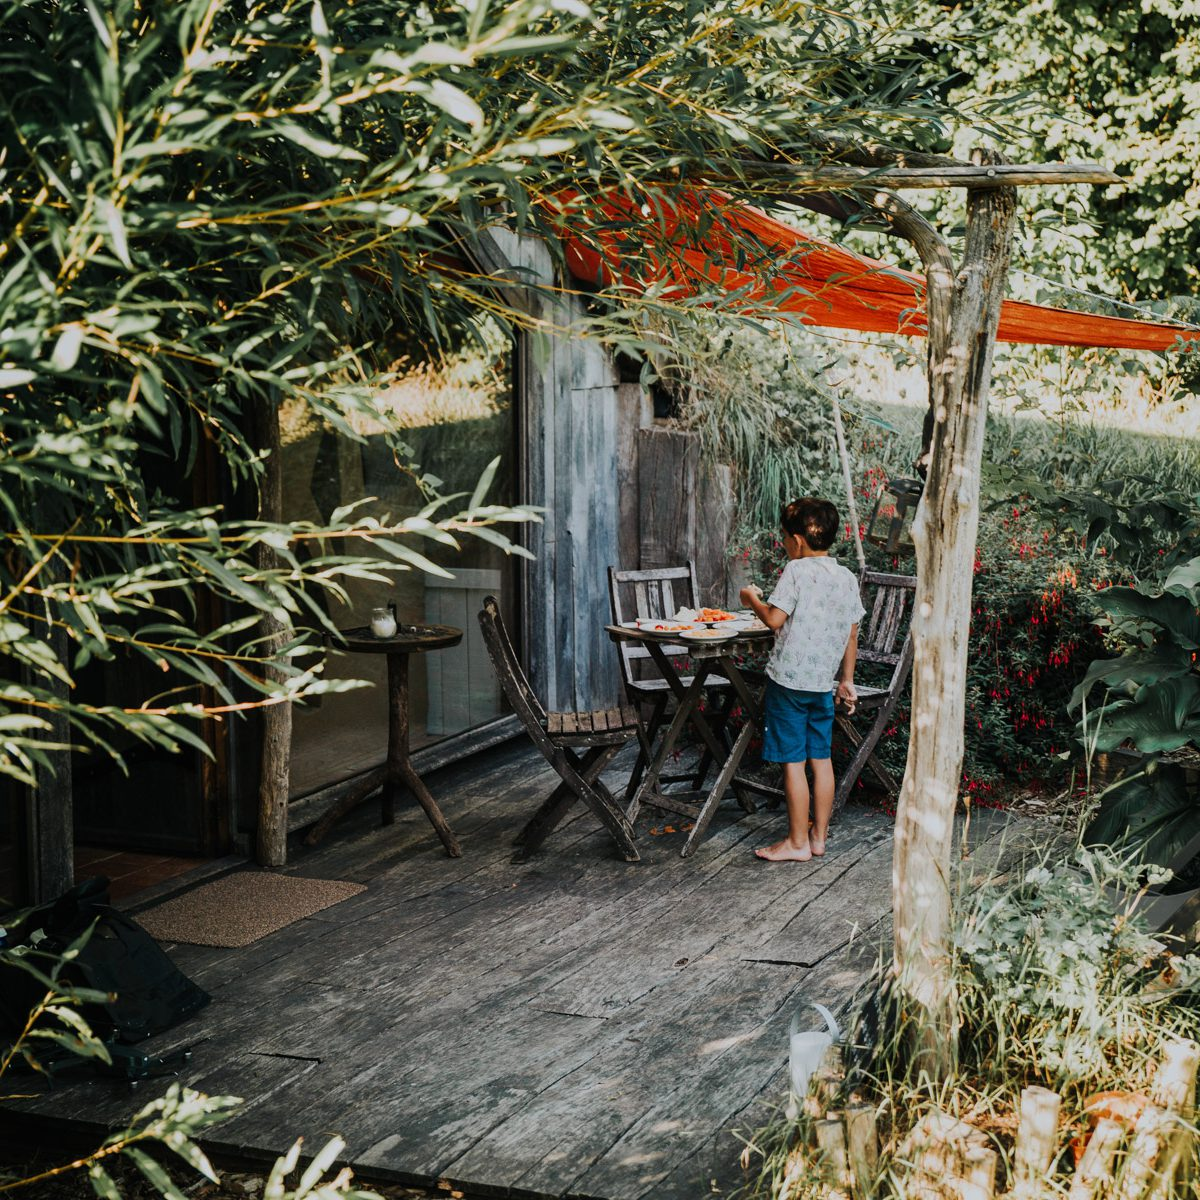 photos ecolodge bretagne 2018-6